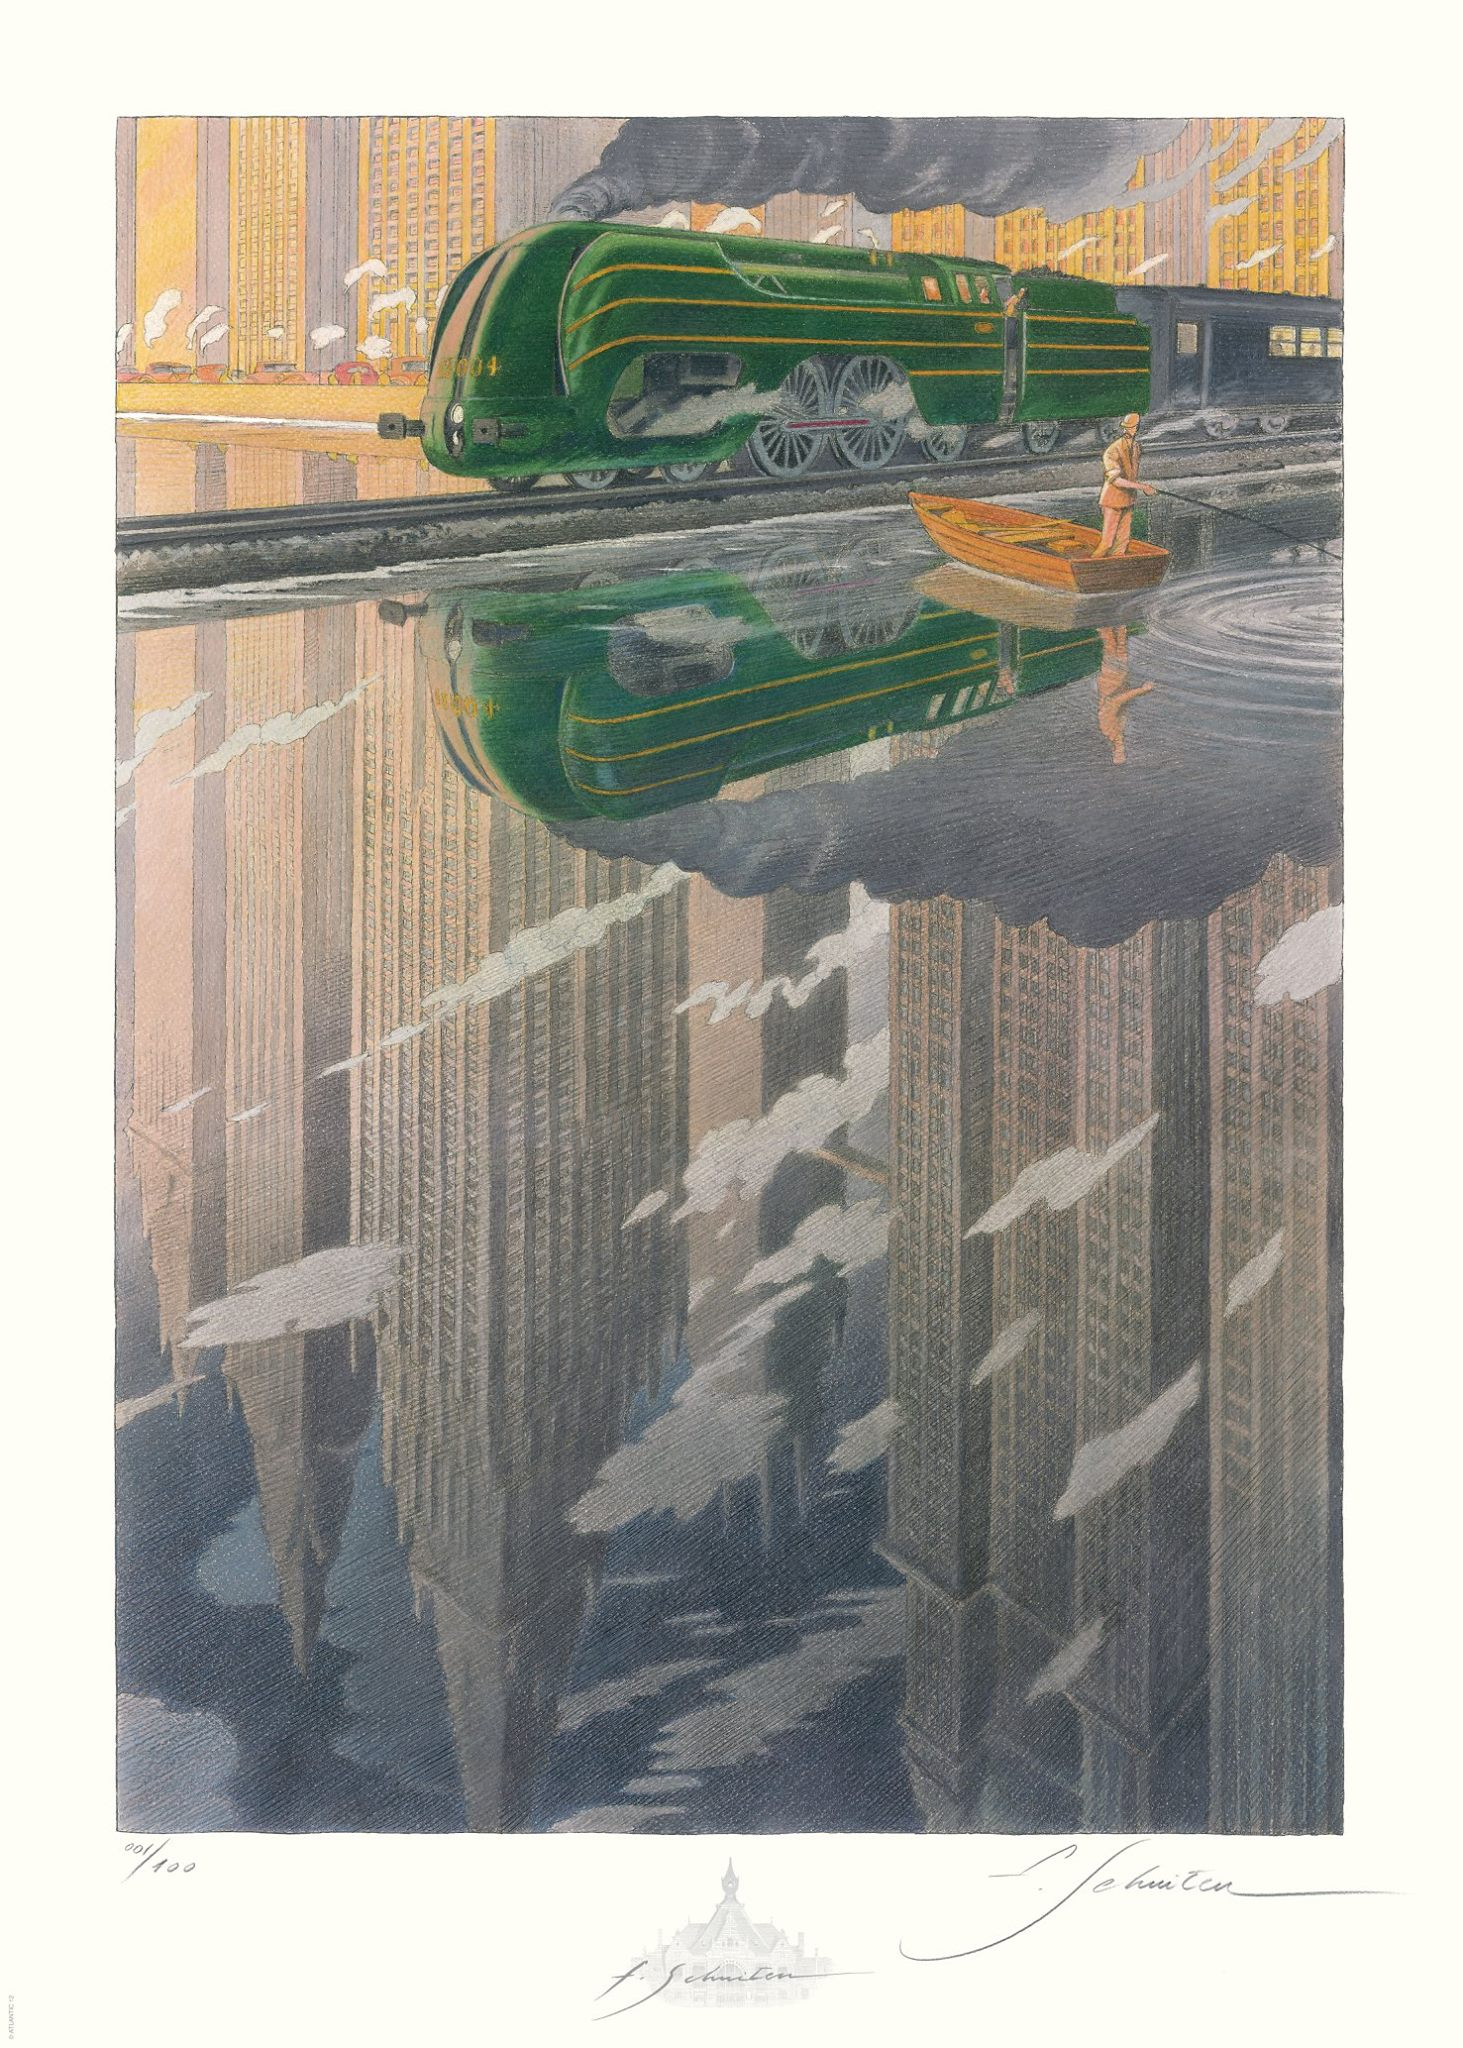 La Type 12 - Reflet by François Schuiten